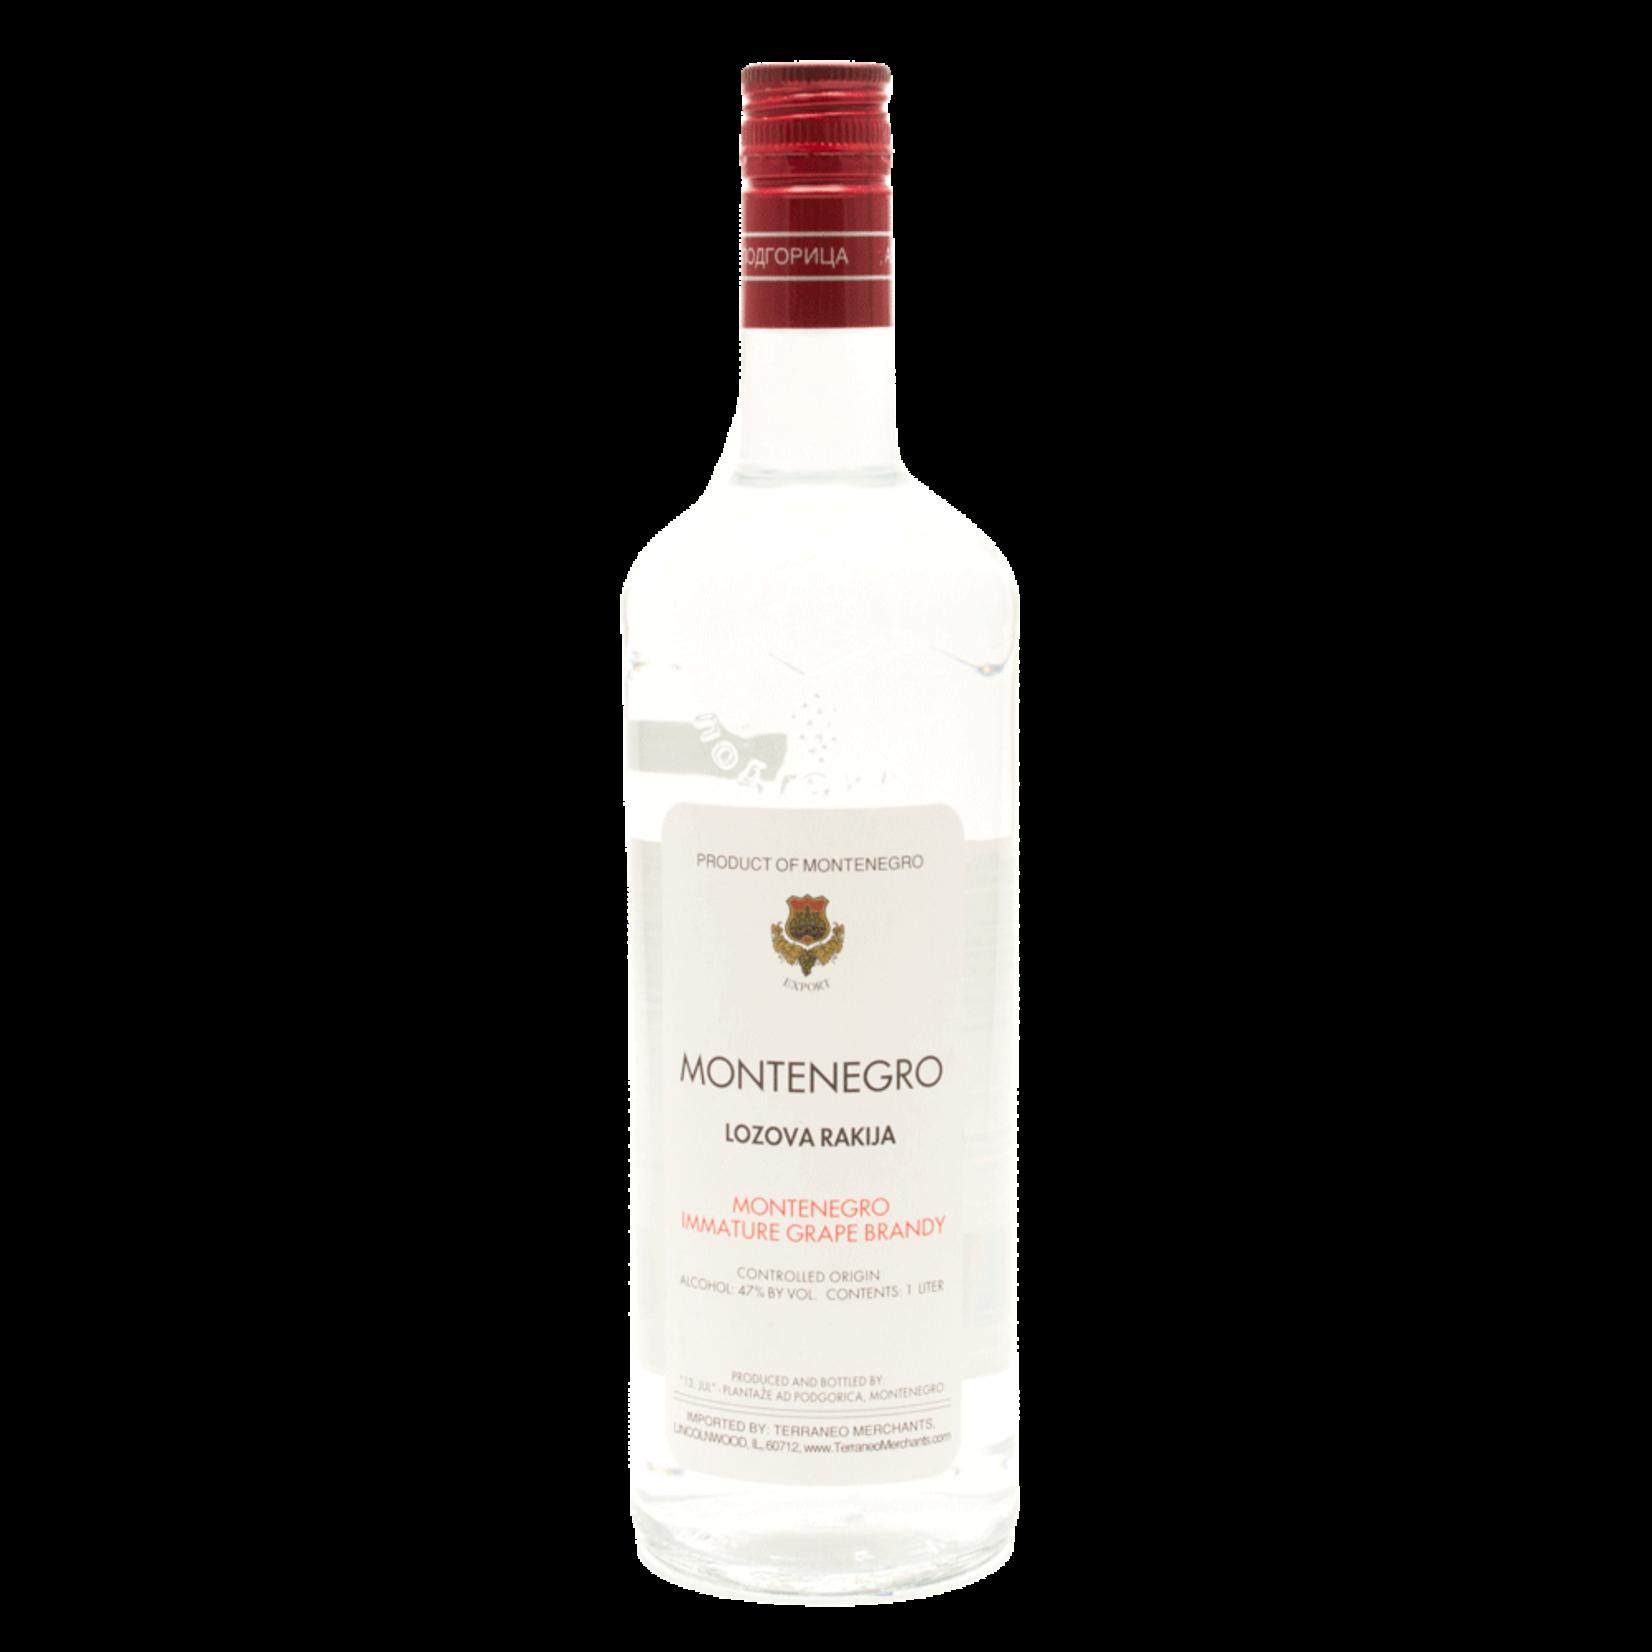 Spirits Montenegro Lozova Rakija 1L